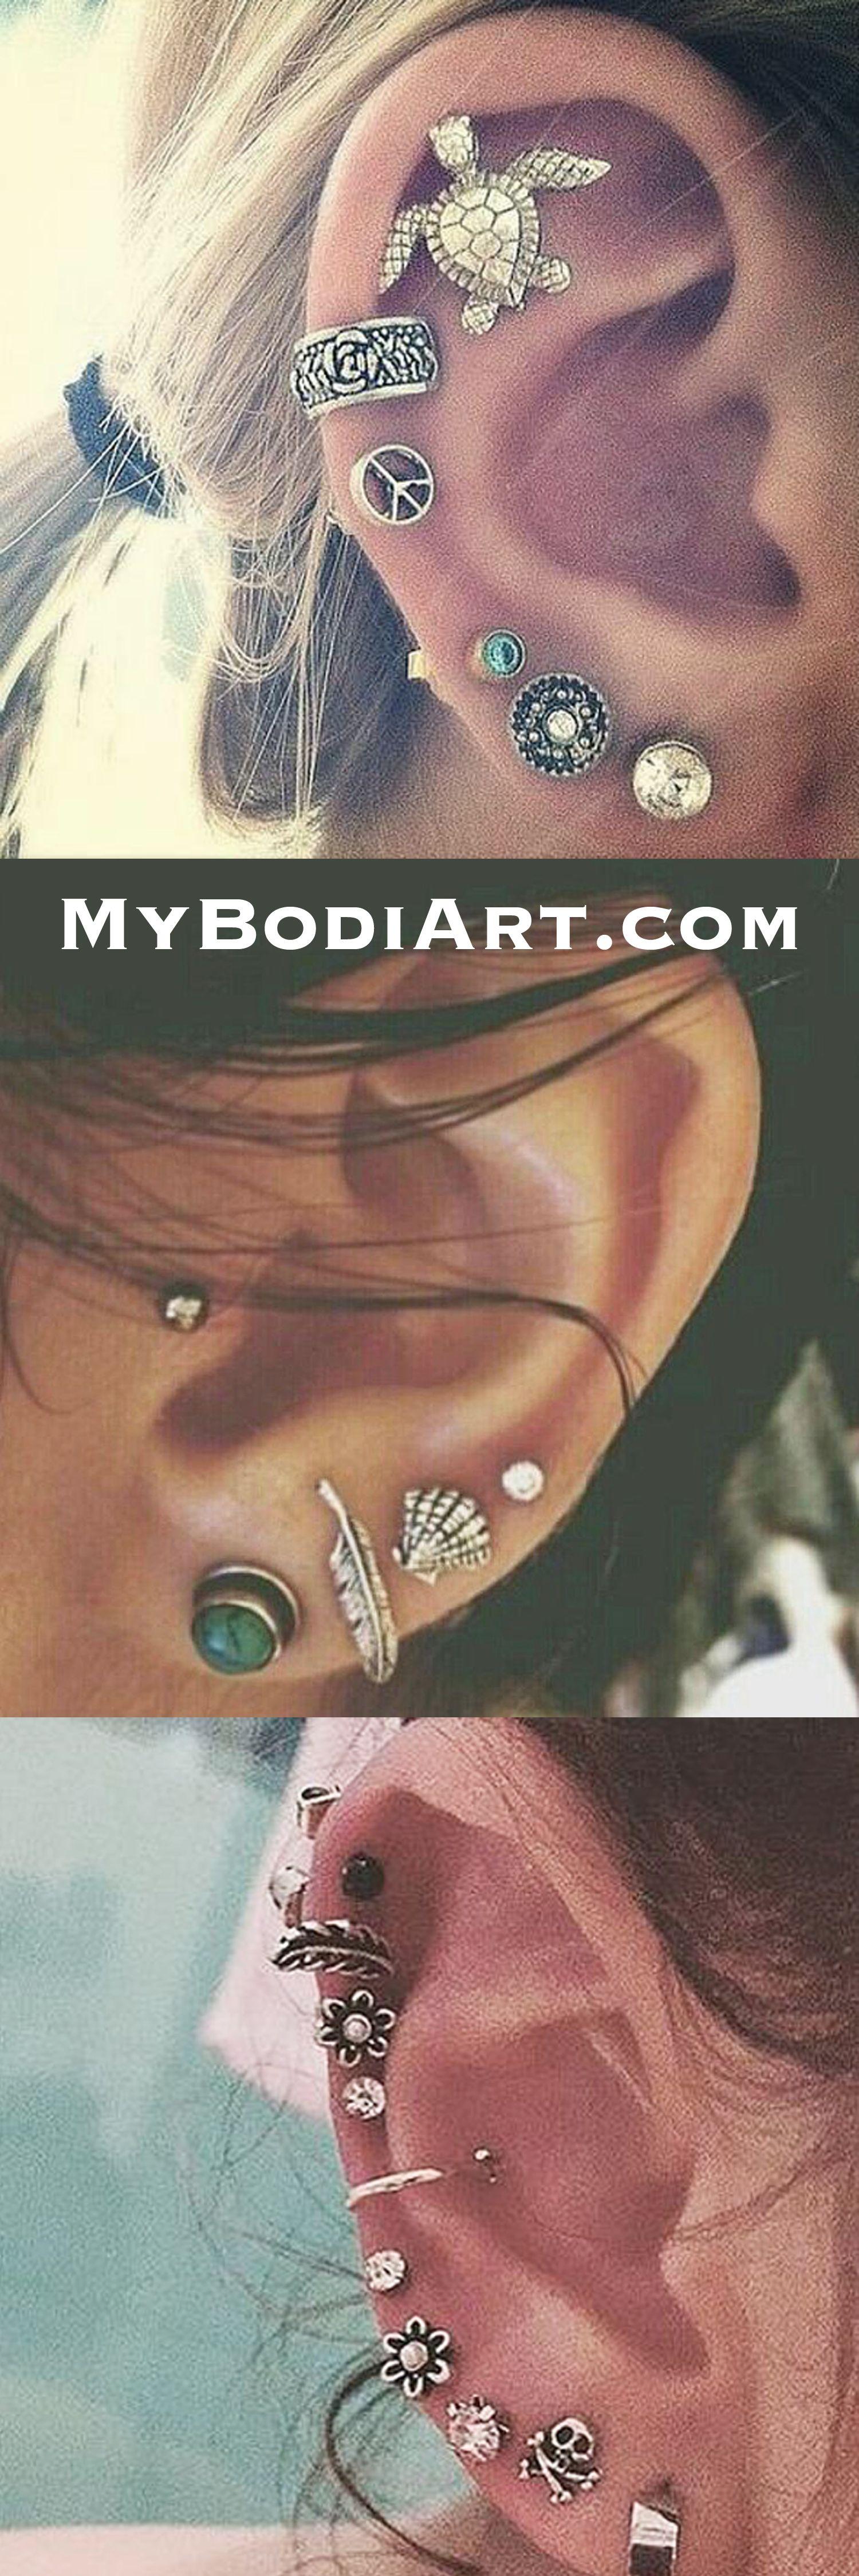 Hollander piercings | Erotic pics)